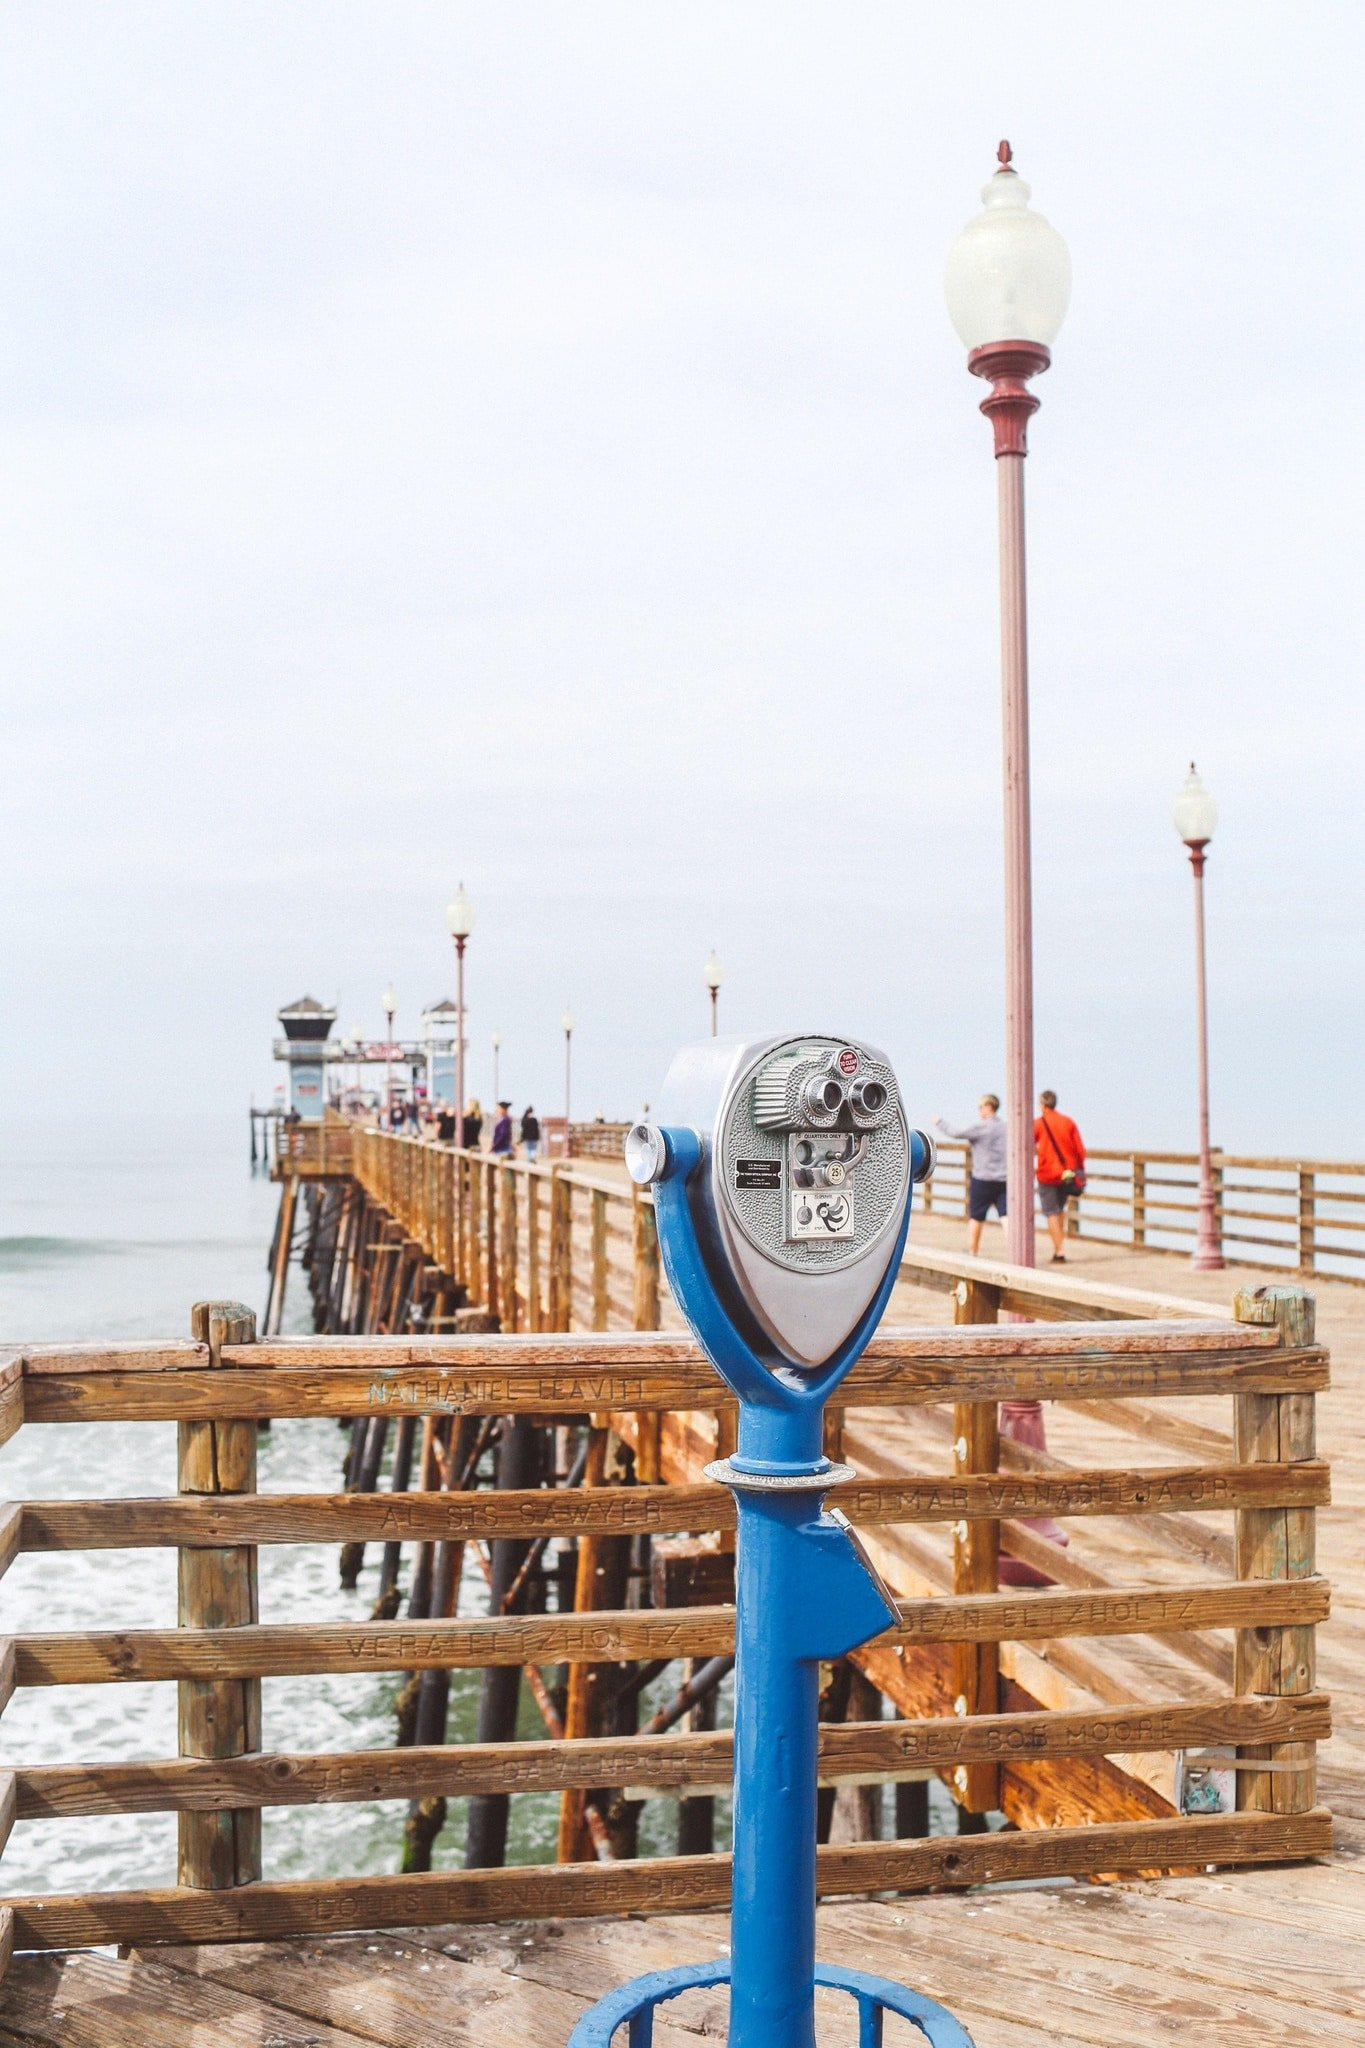 Pier in Oceanside, Ca